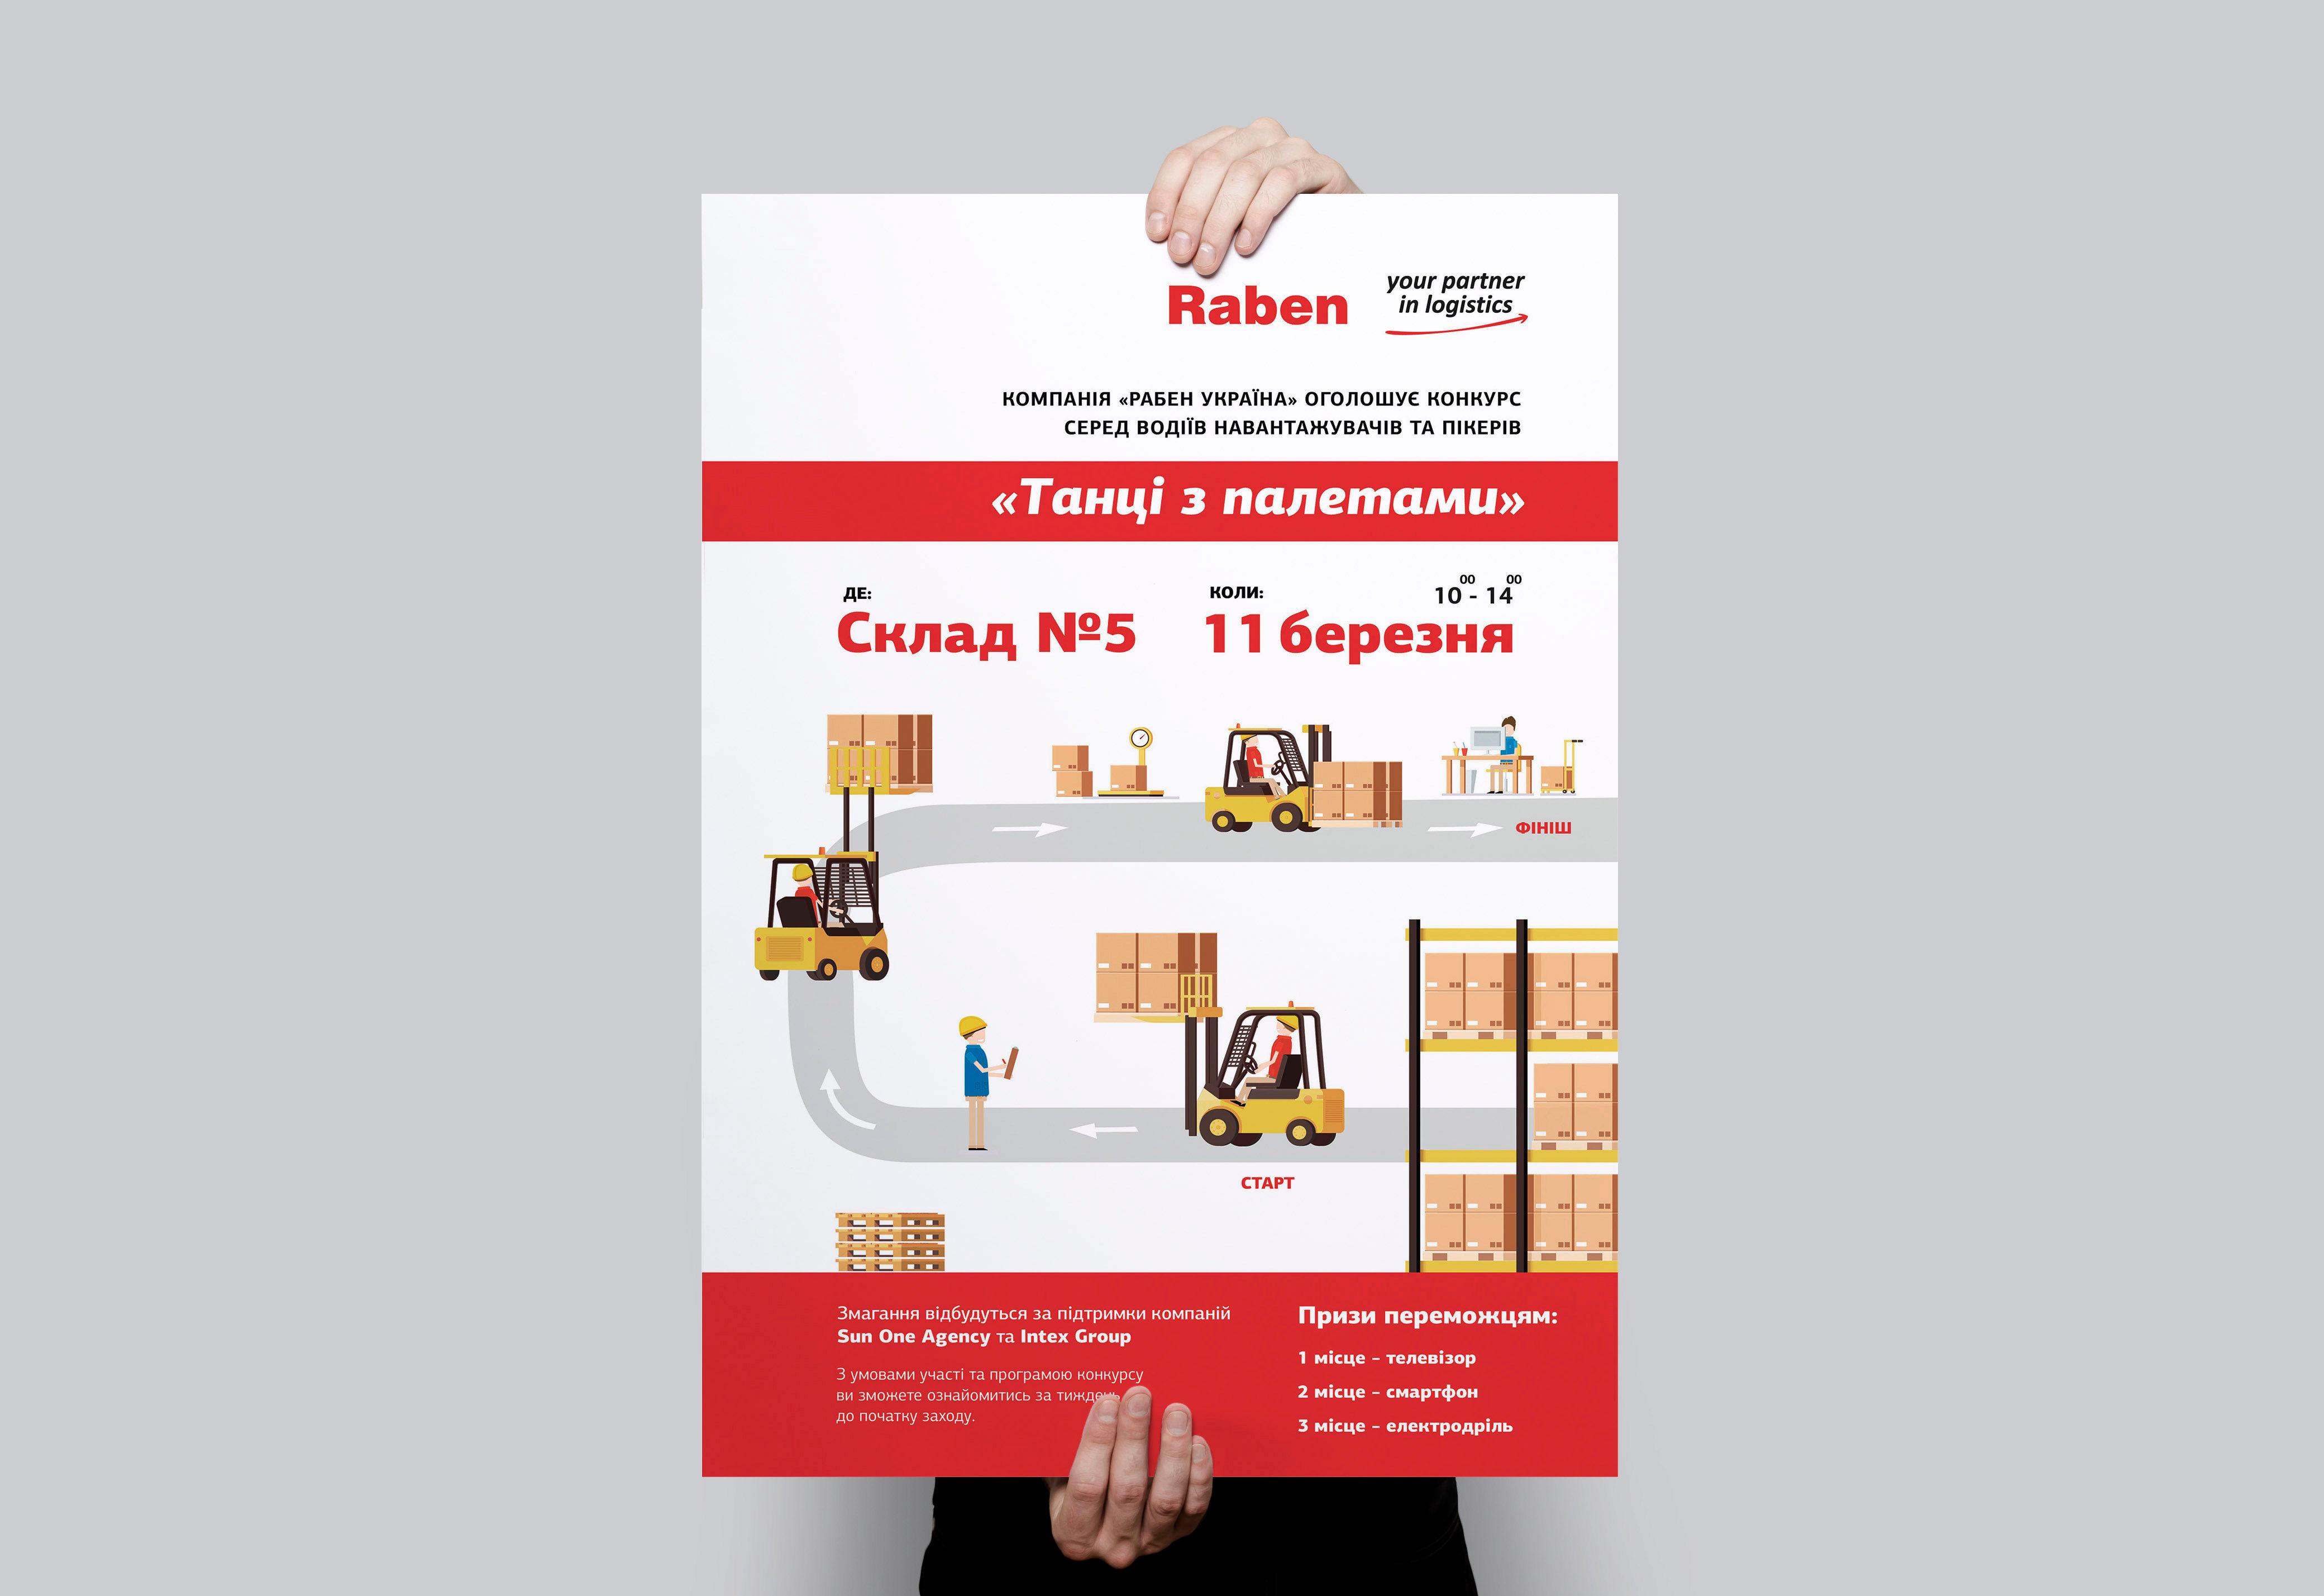 Logistic company poster design